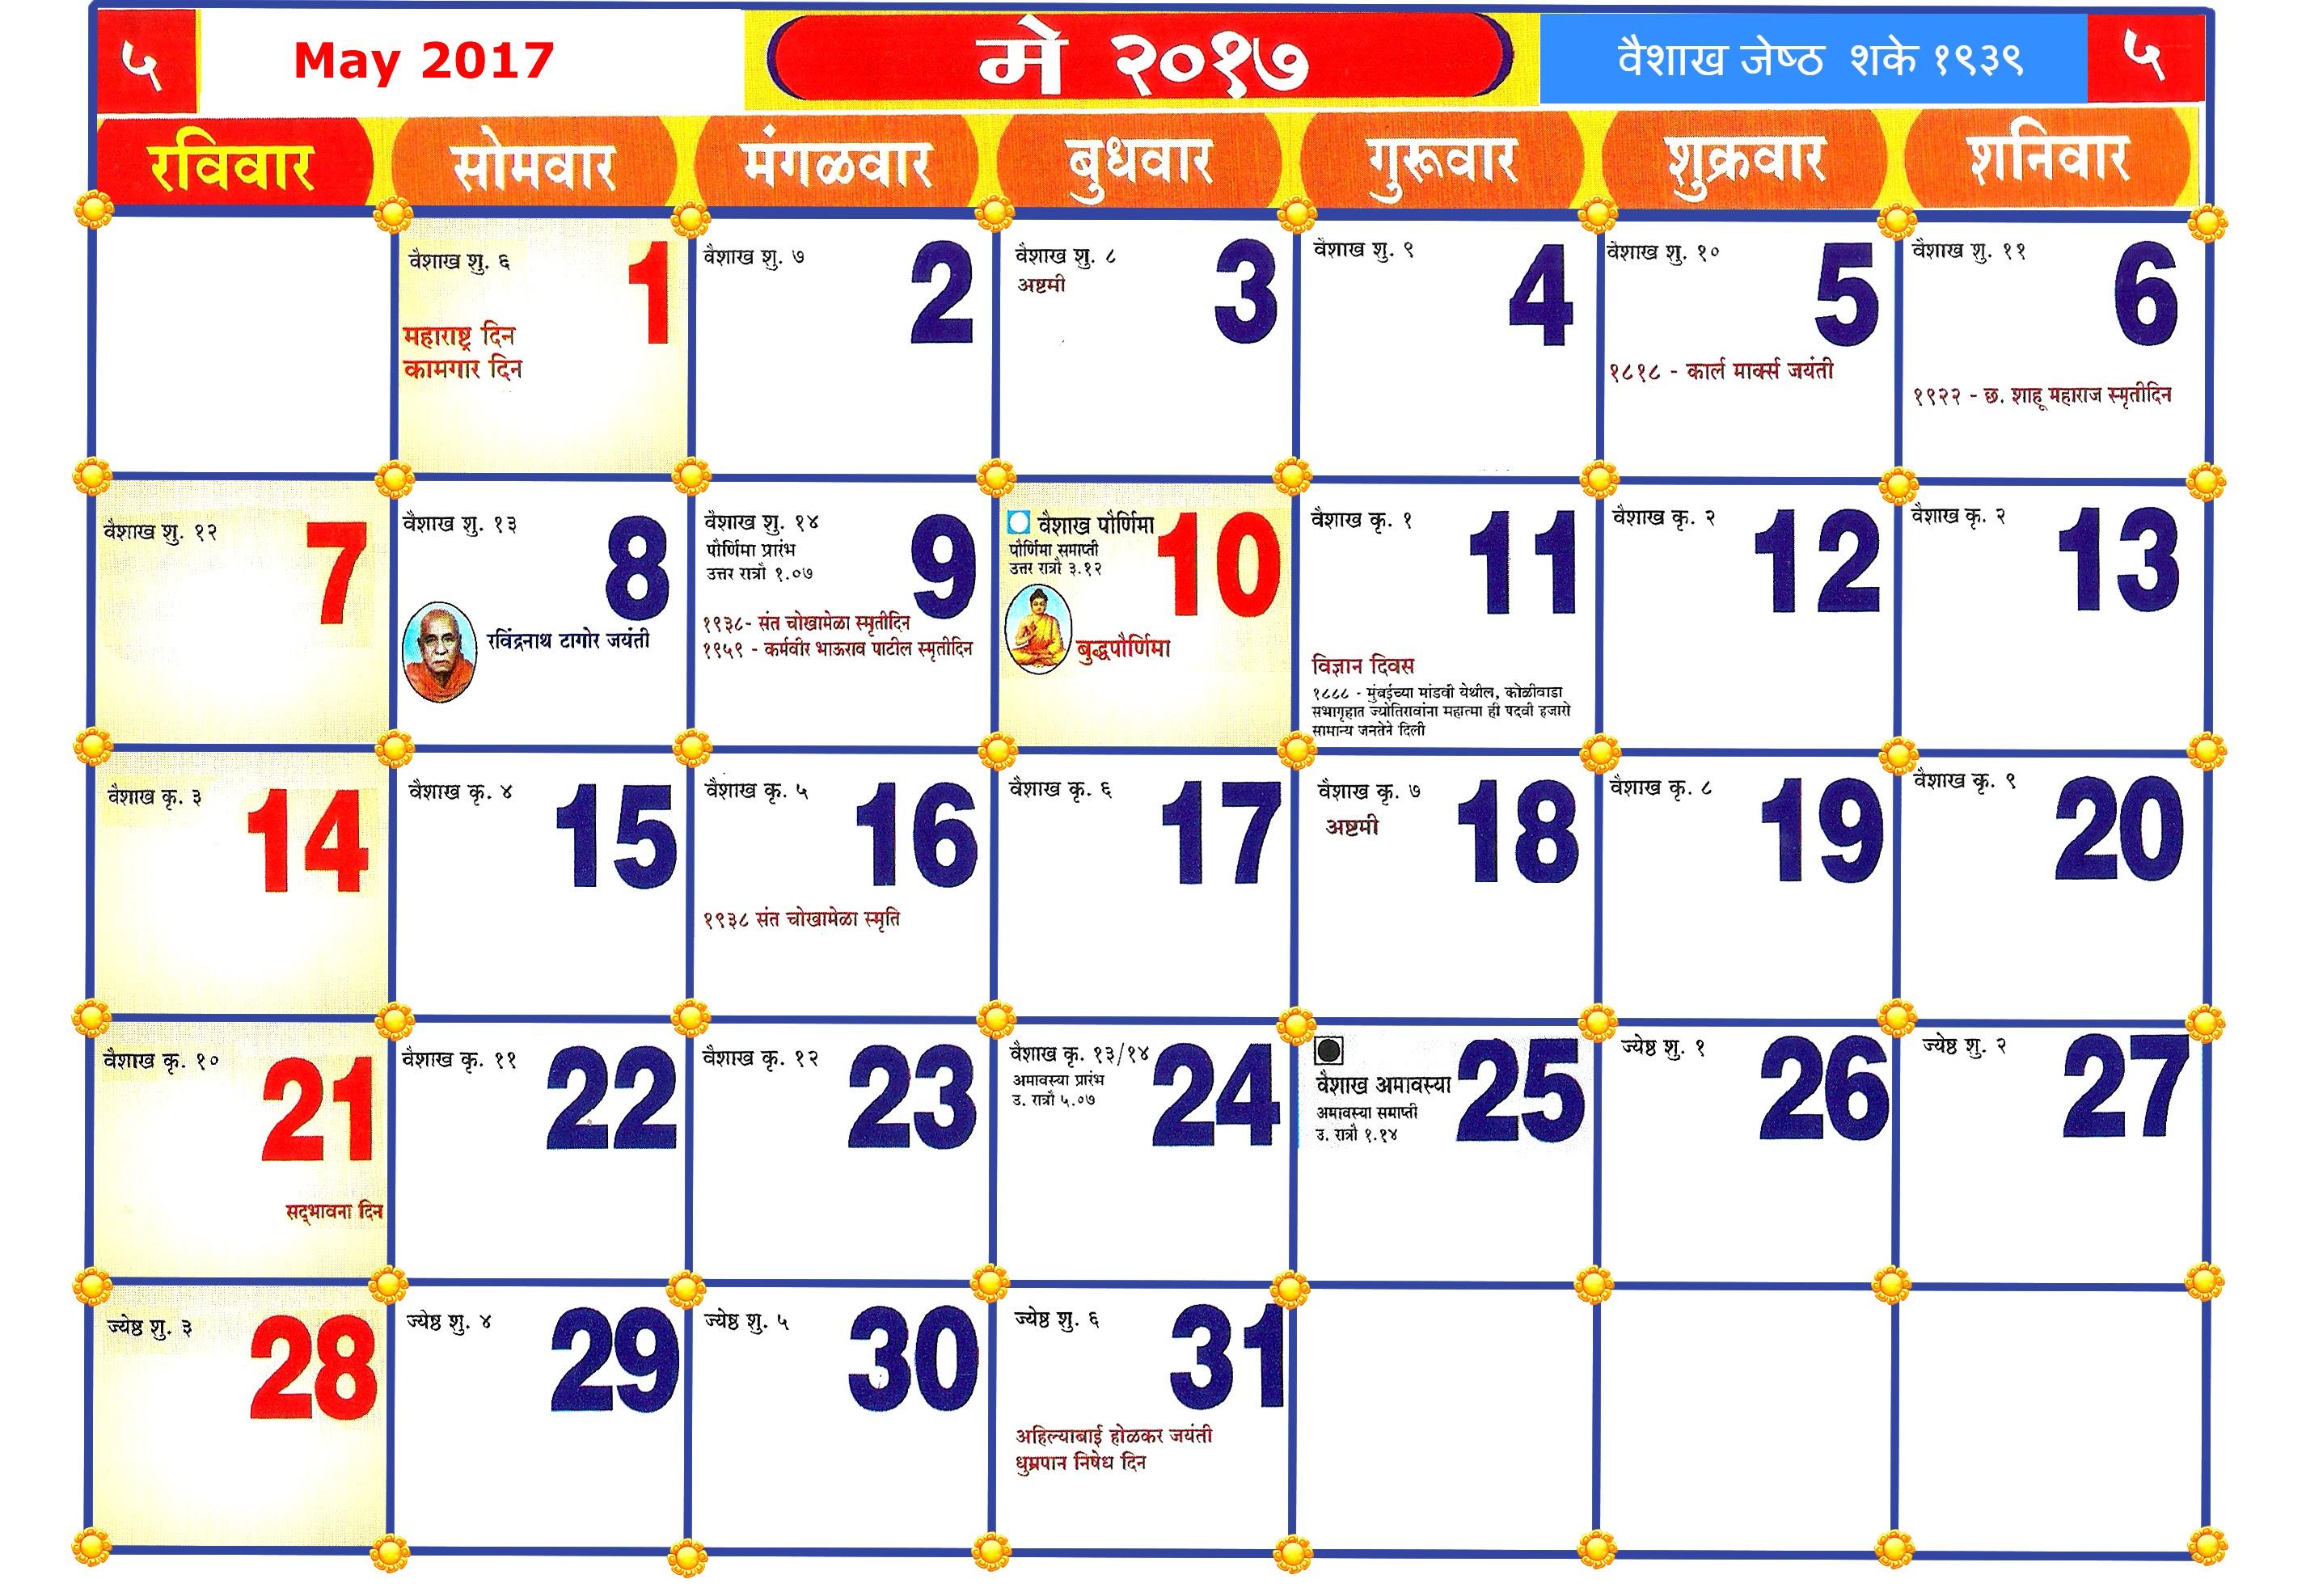 March 2017 Calendar Kalnirnay | february calendars